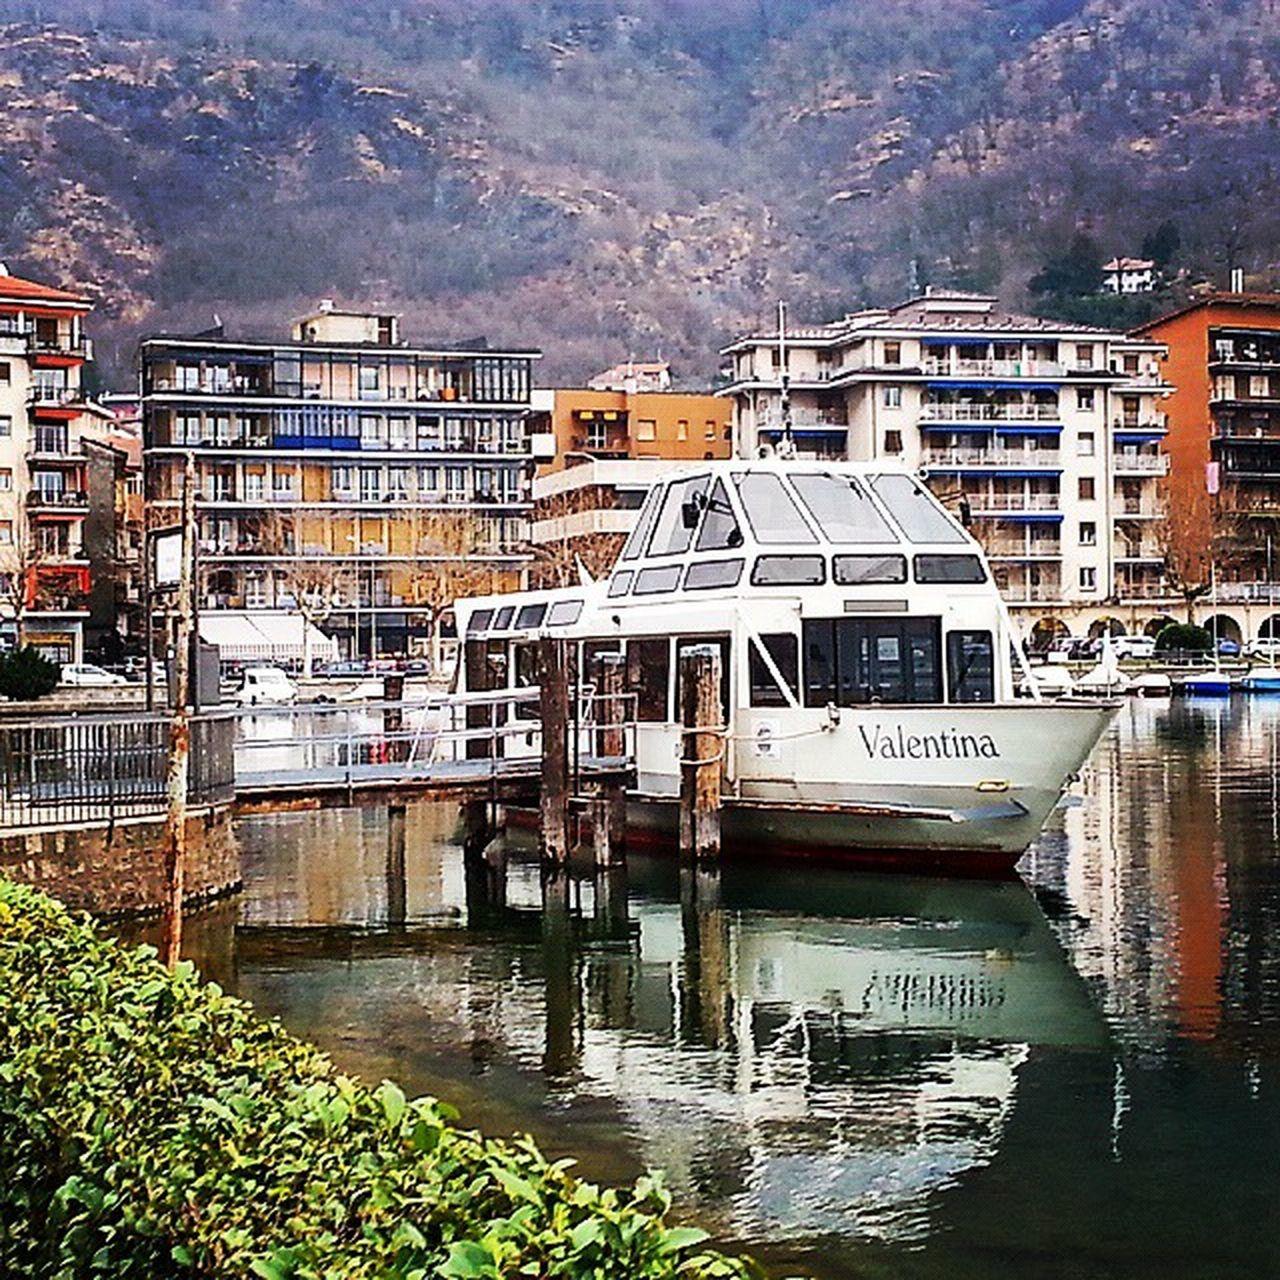 Imbarcadero Omegna Lago d' Orta  Lake Verbanocusioossola